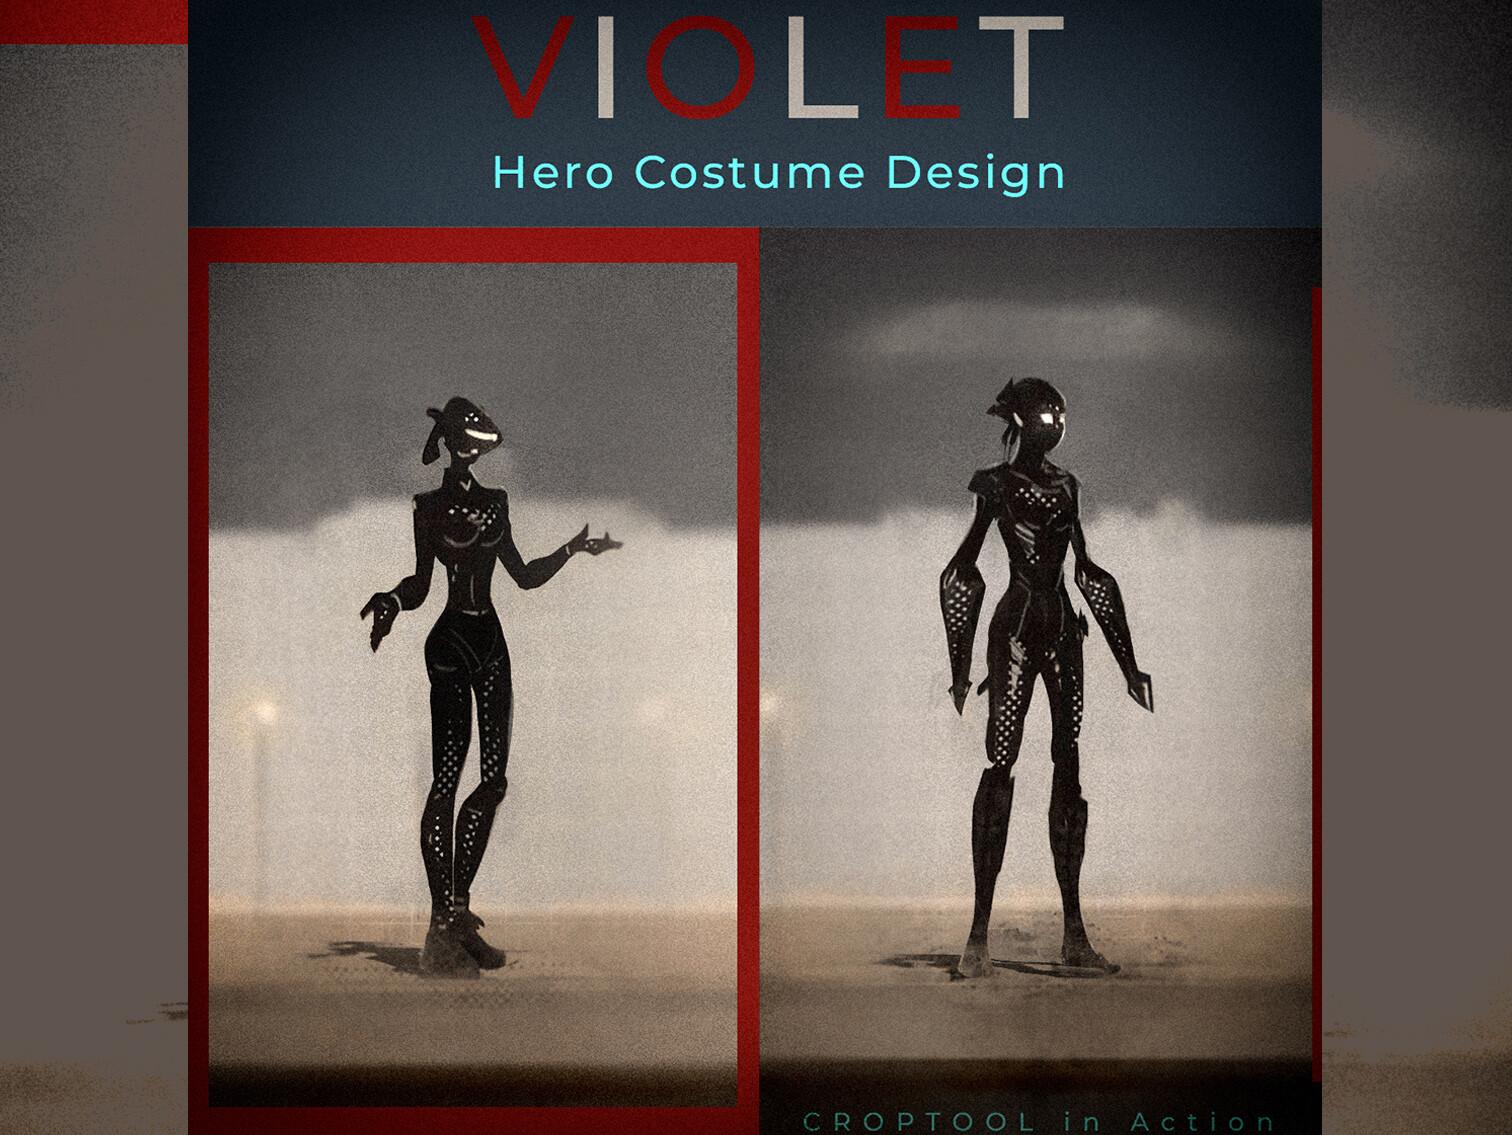 VIOLET (Costume Design)